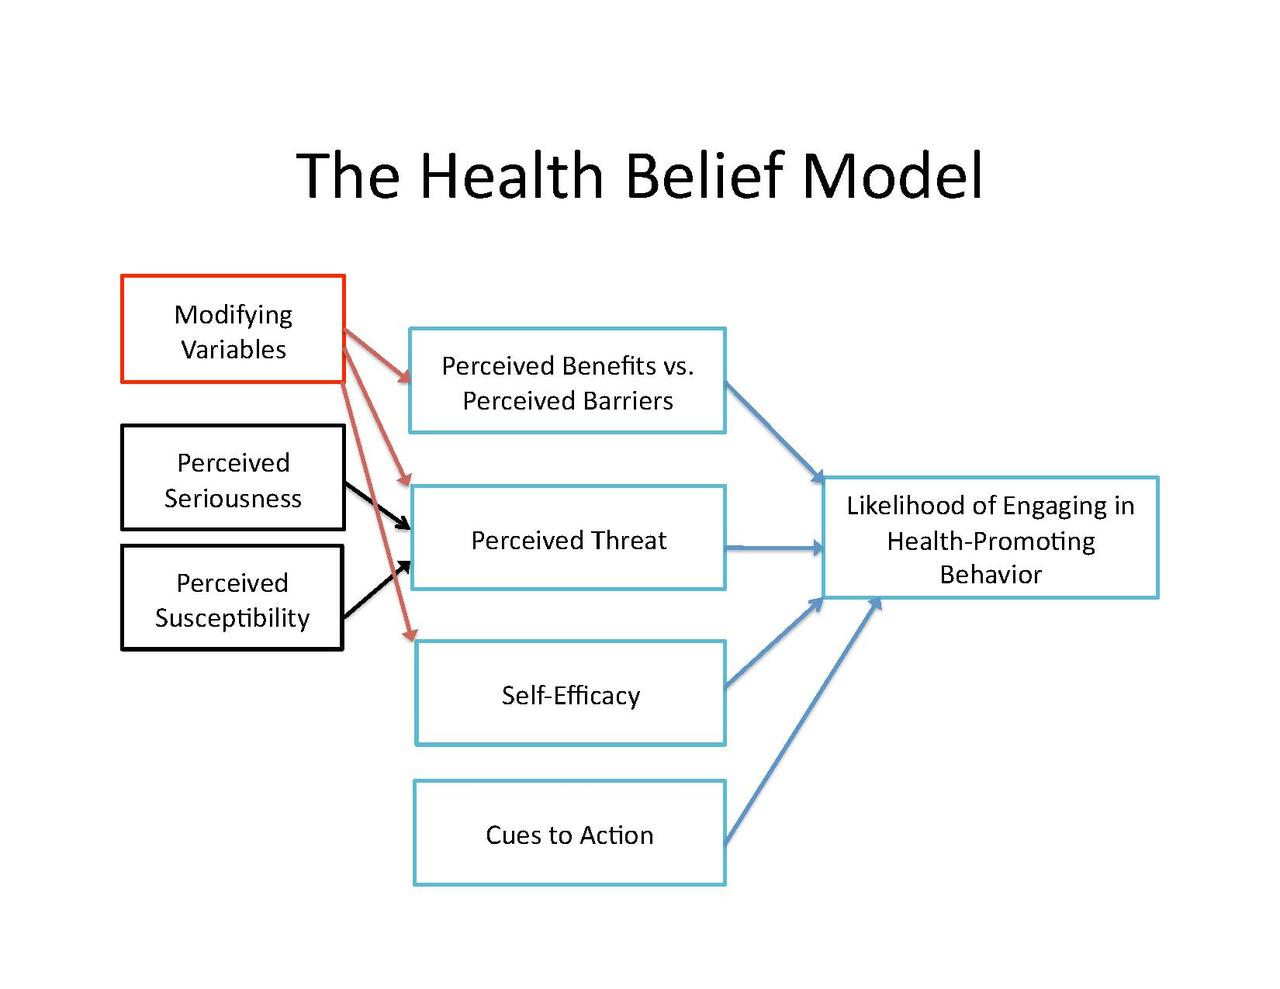 File The Health Belief Model